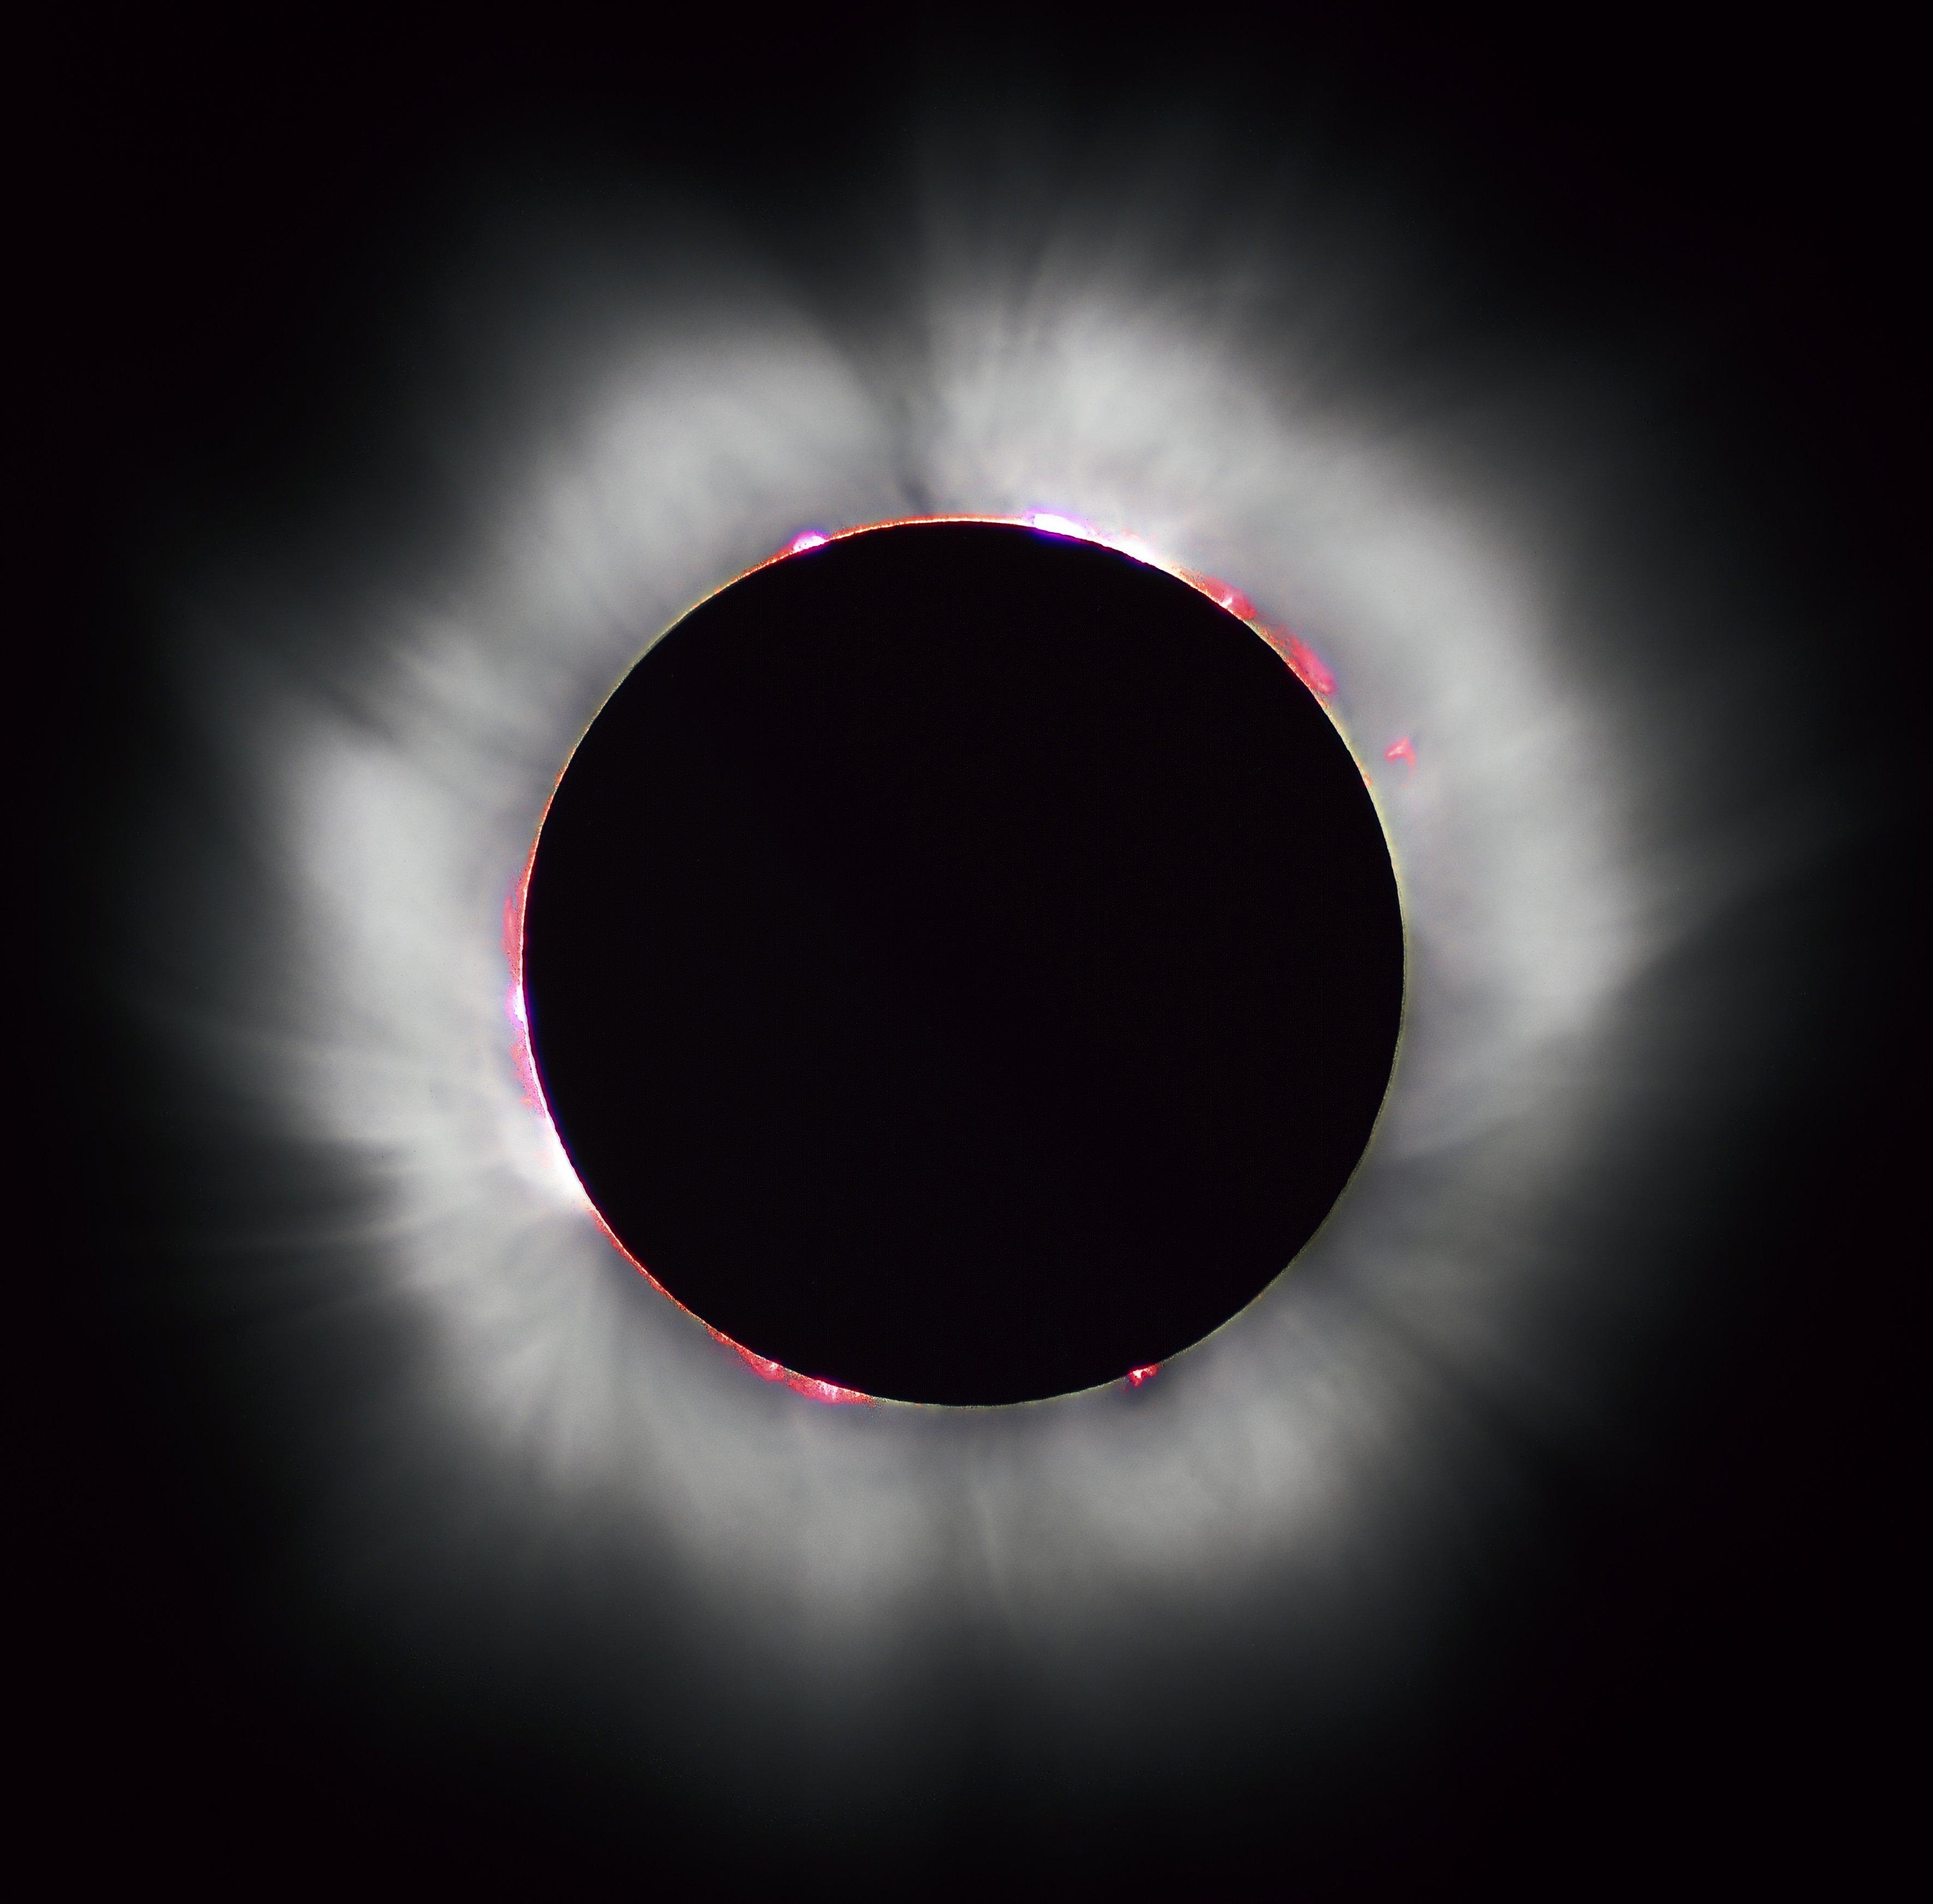 Solar Eclipse August 2017